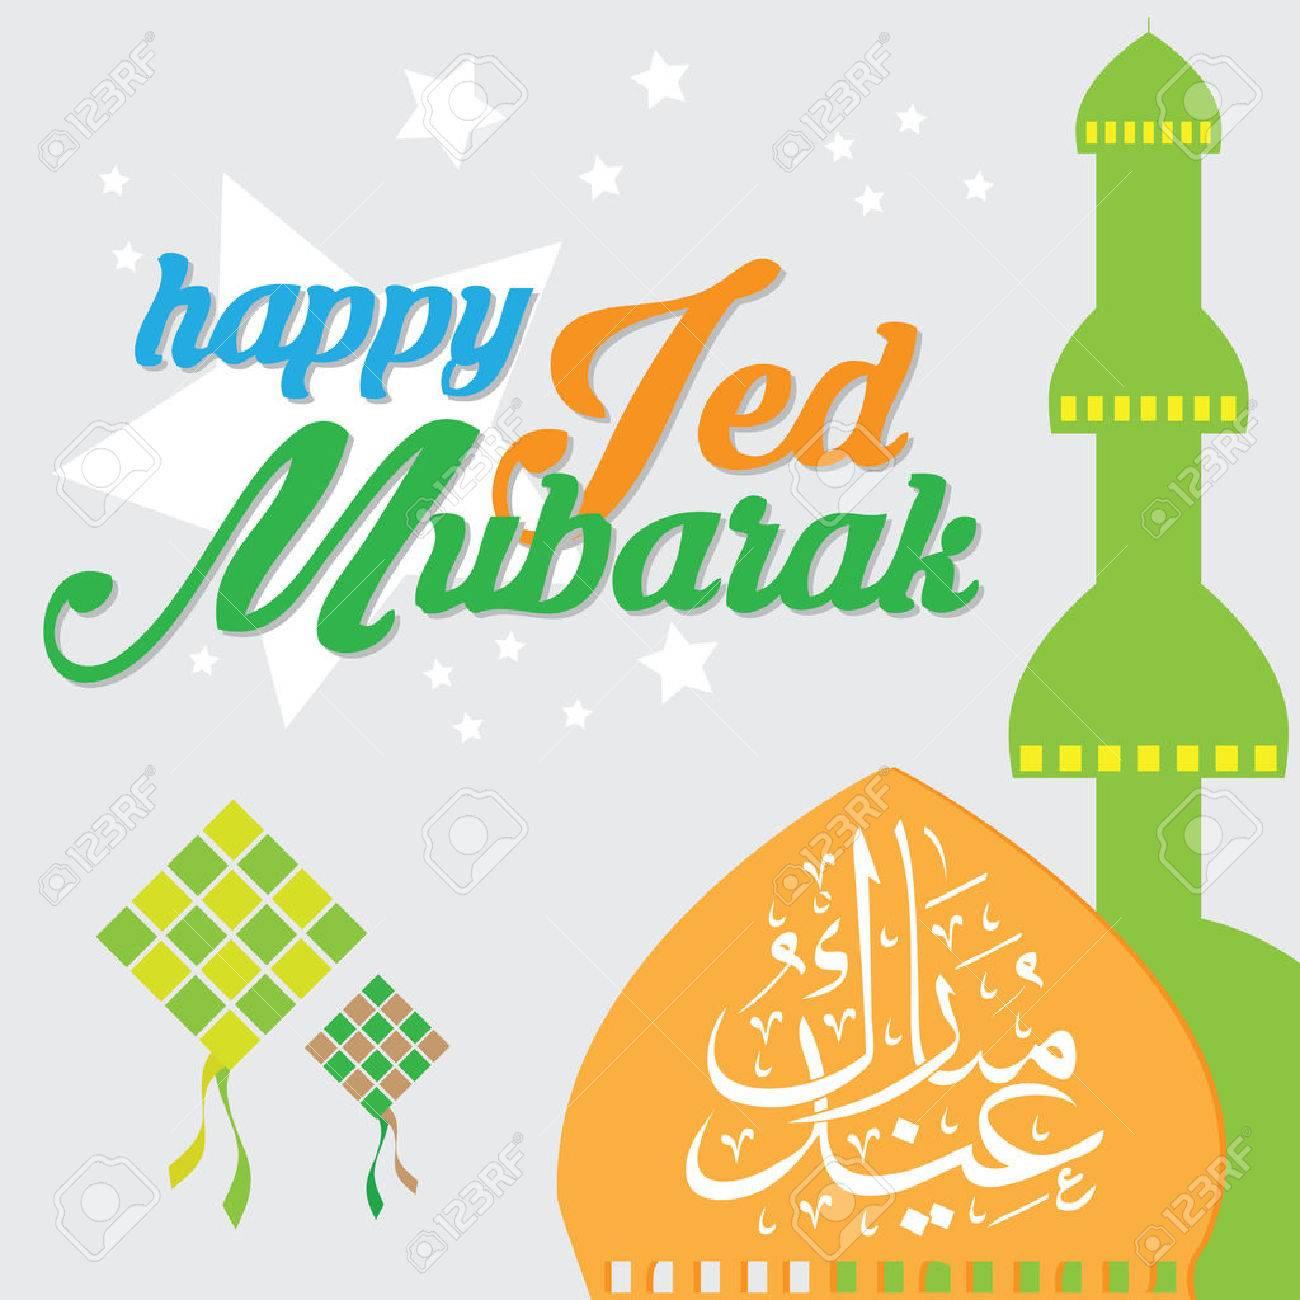 Greeting Card Happy Ied Mubarak Royalty Free Cliparts Vectors And